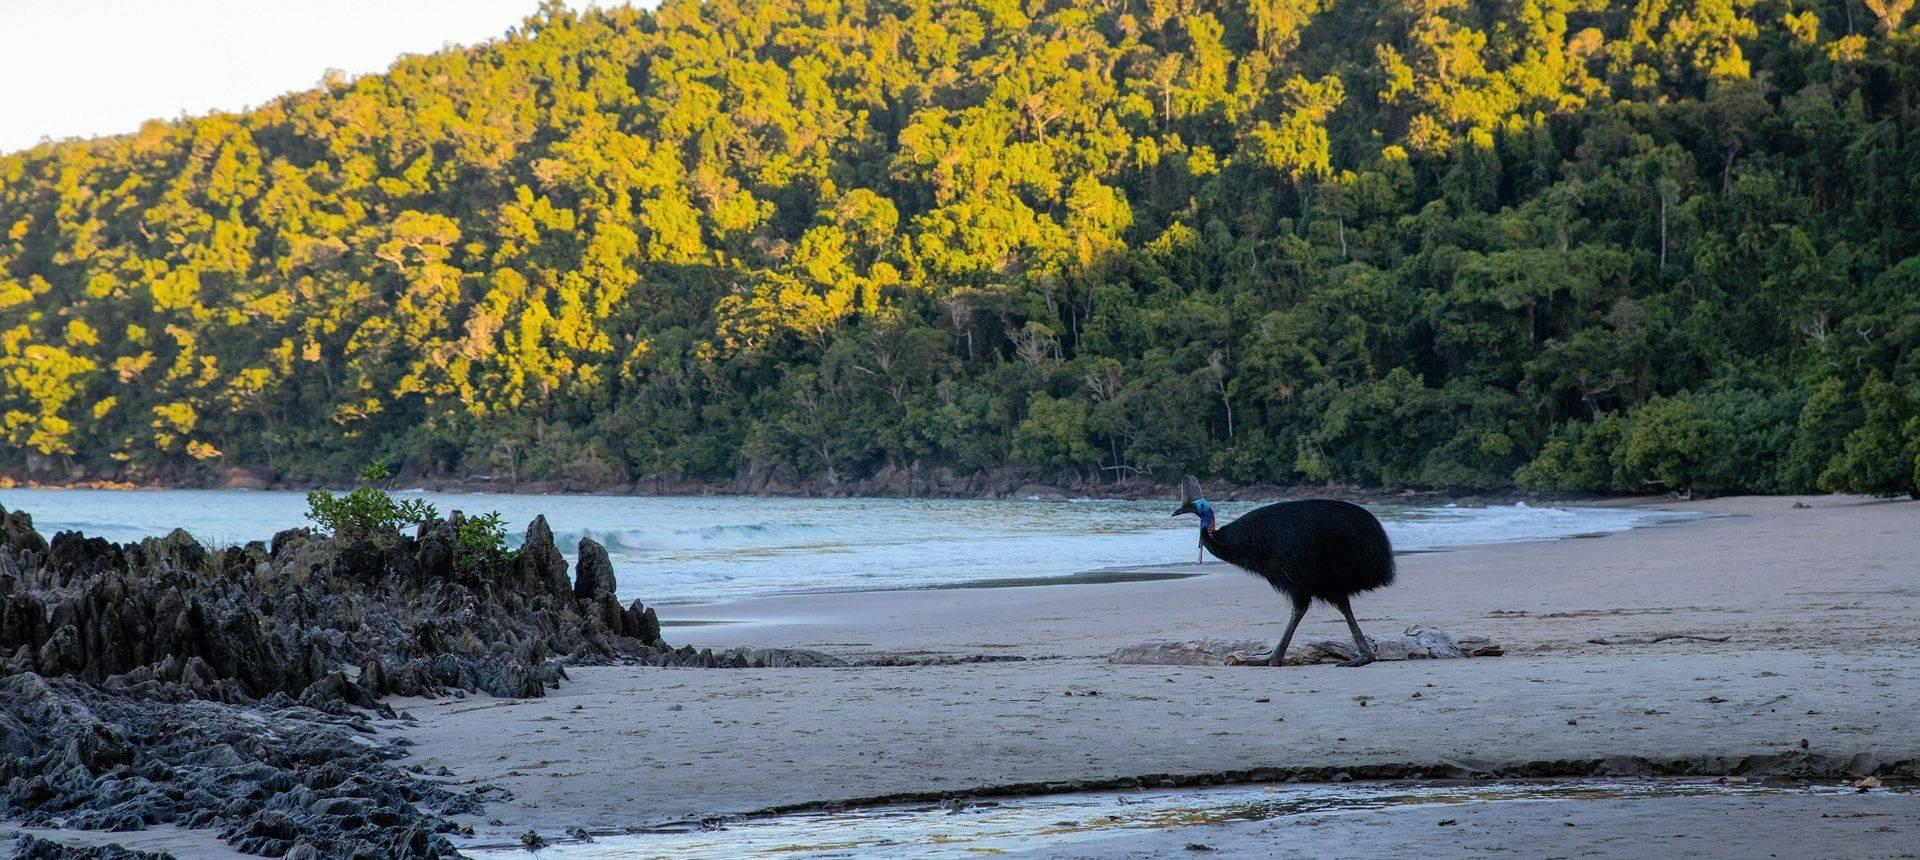 Southern Cassowary, Australia Shutterstock 1173043753